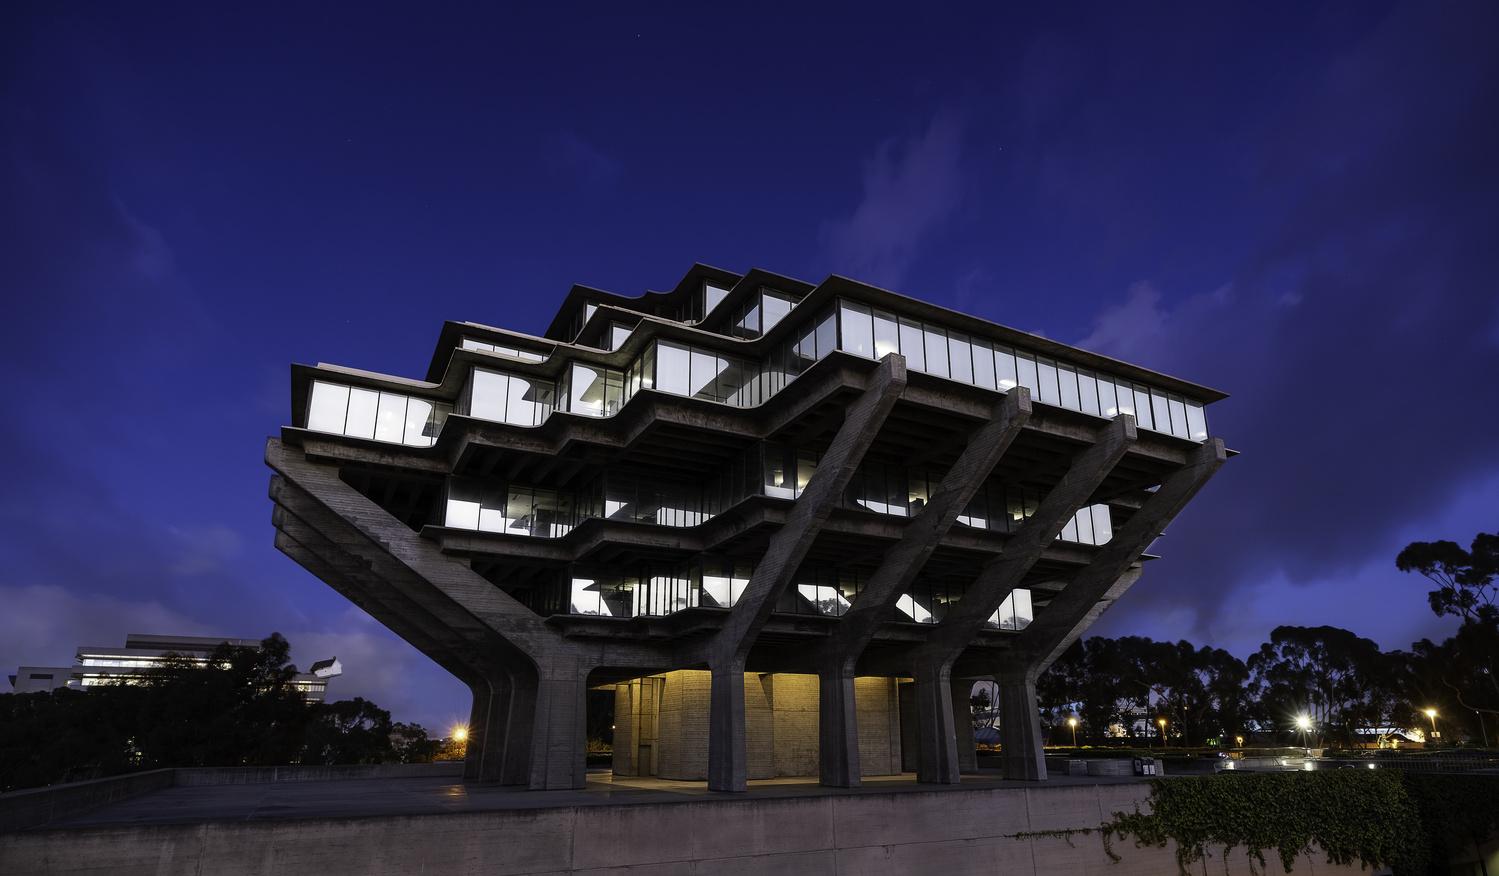 Geissel Library by Steve Batiz